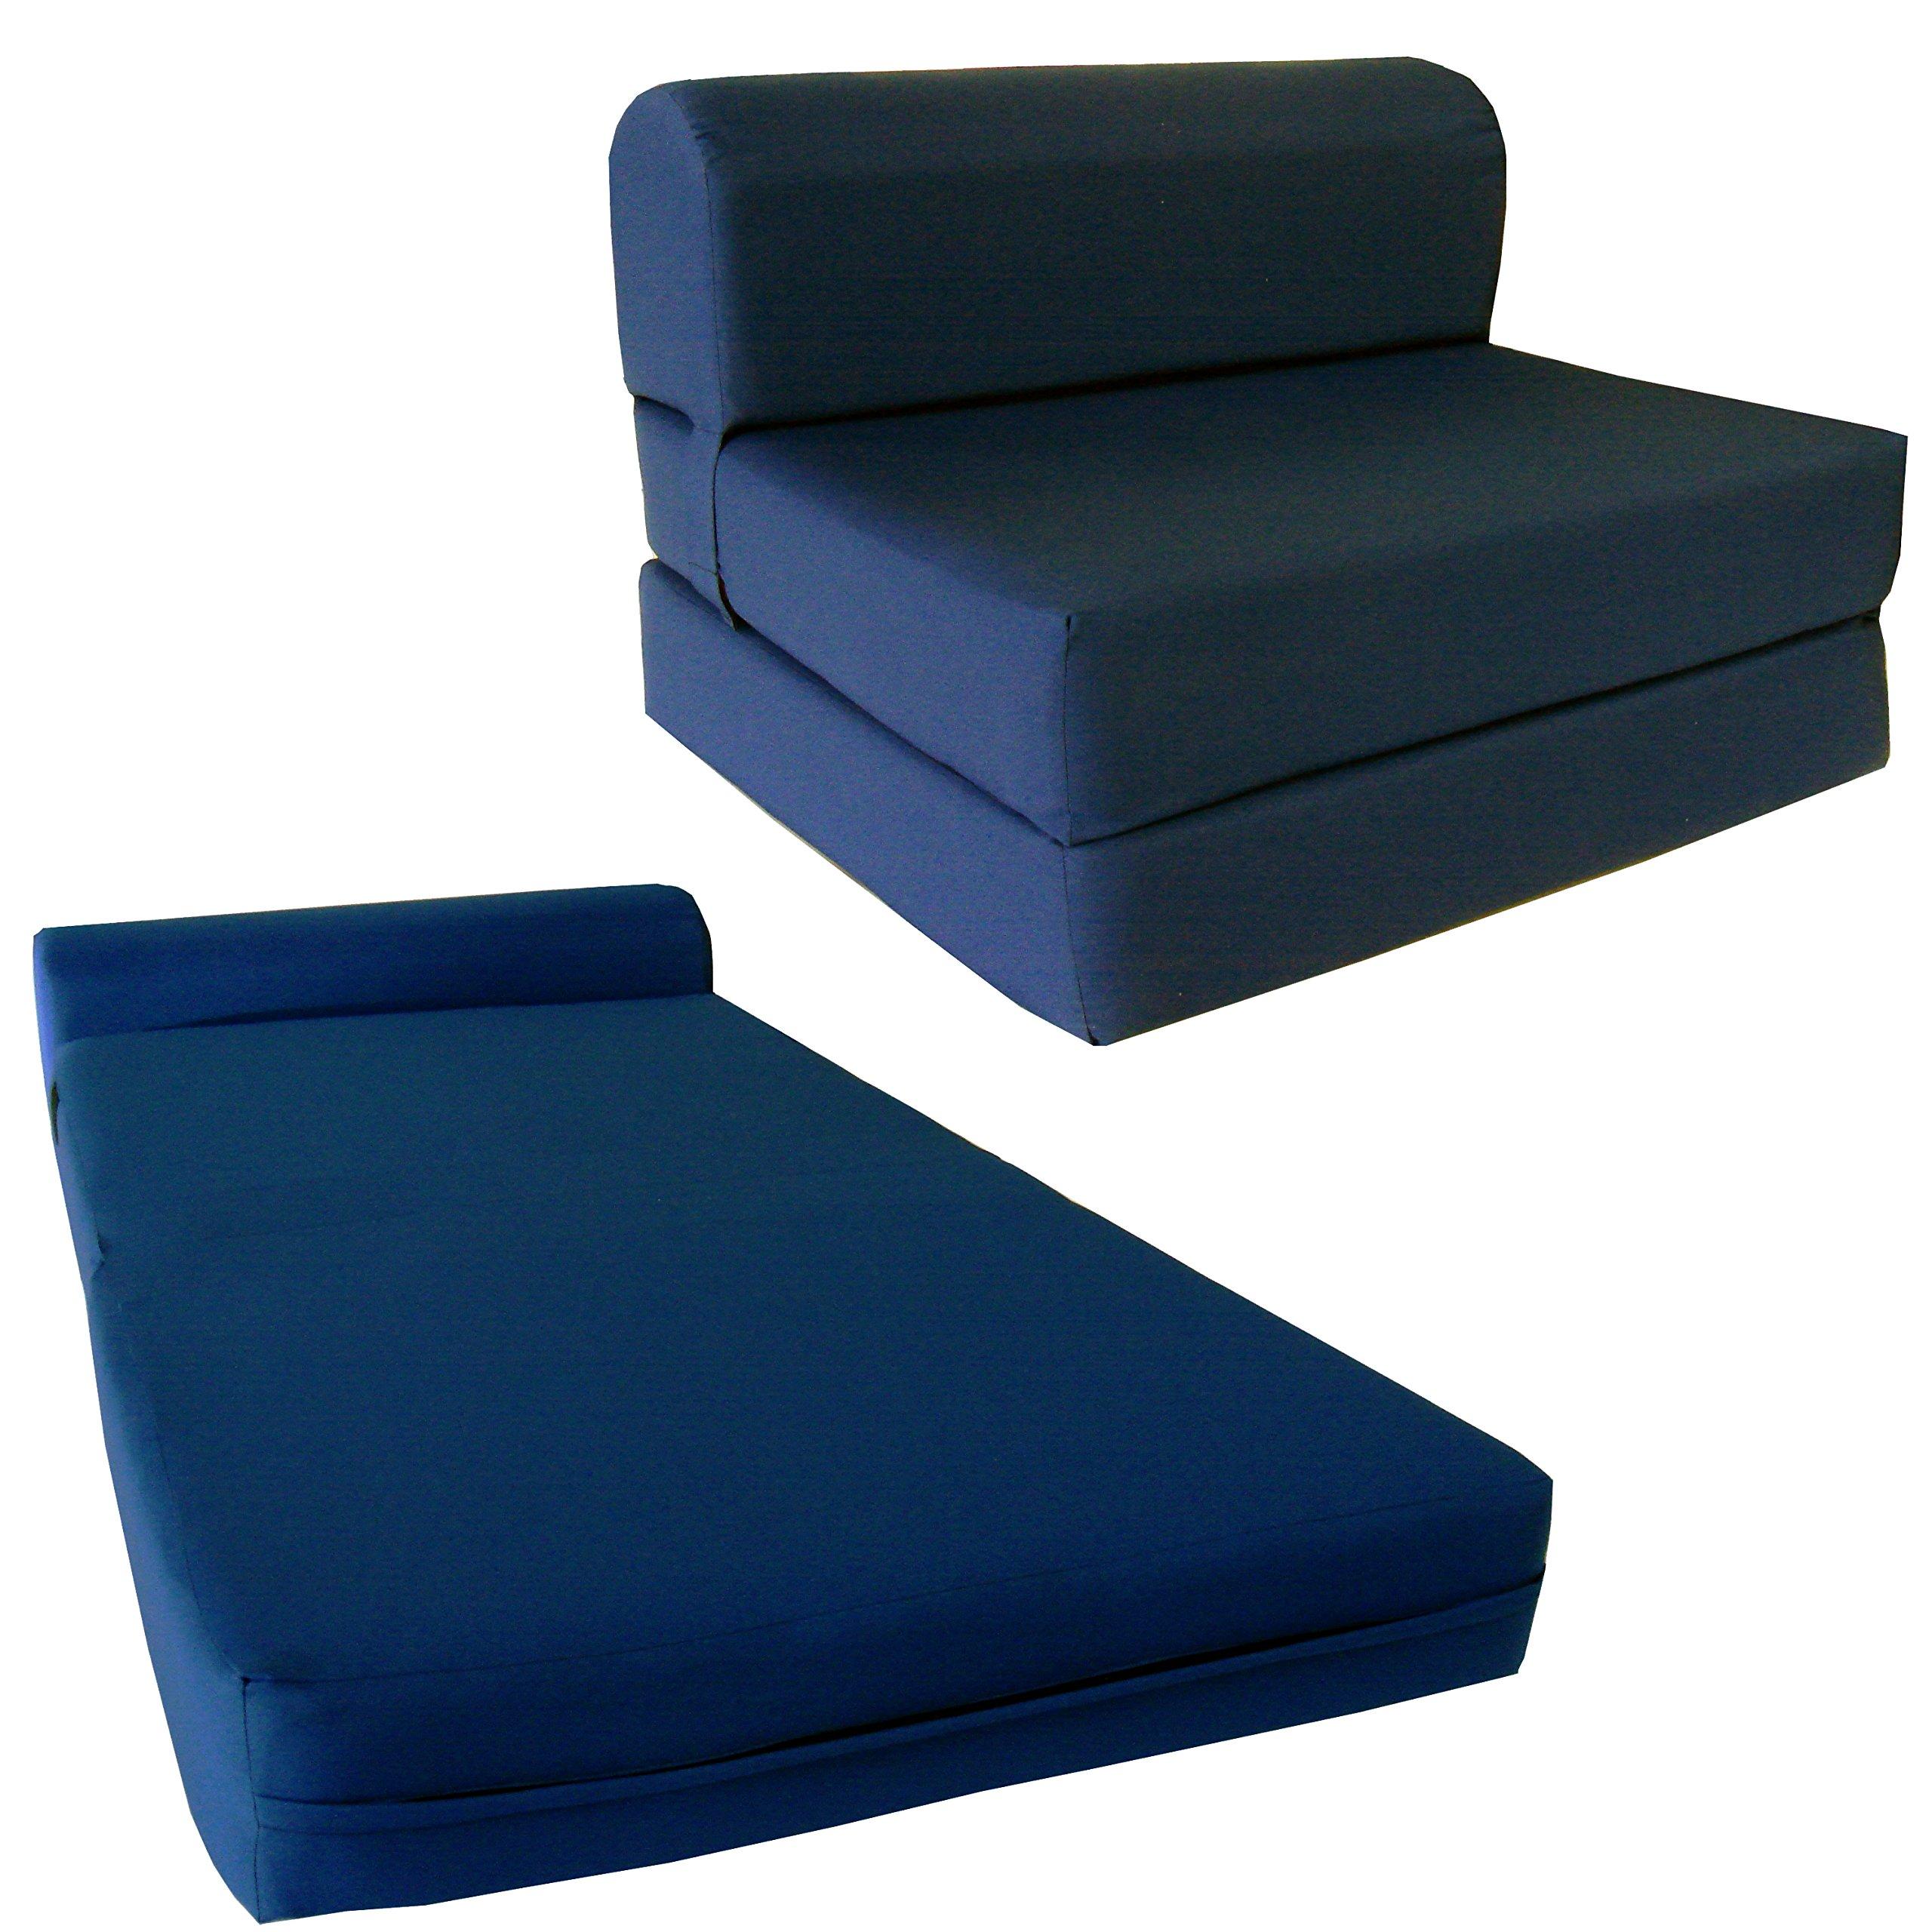 D&D Futon Furniture Chair Folding Foam Bed, Studio Sofa Guest Folded Foam Mattress (6'' x 48'' x 72'', Navy Blue) by D&D Futon Furniture.